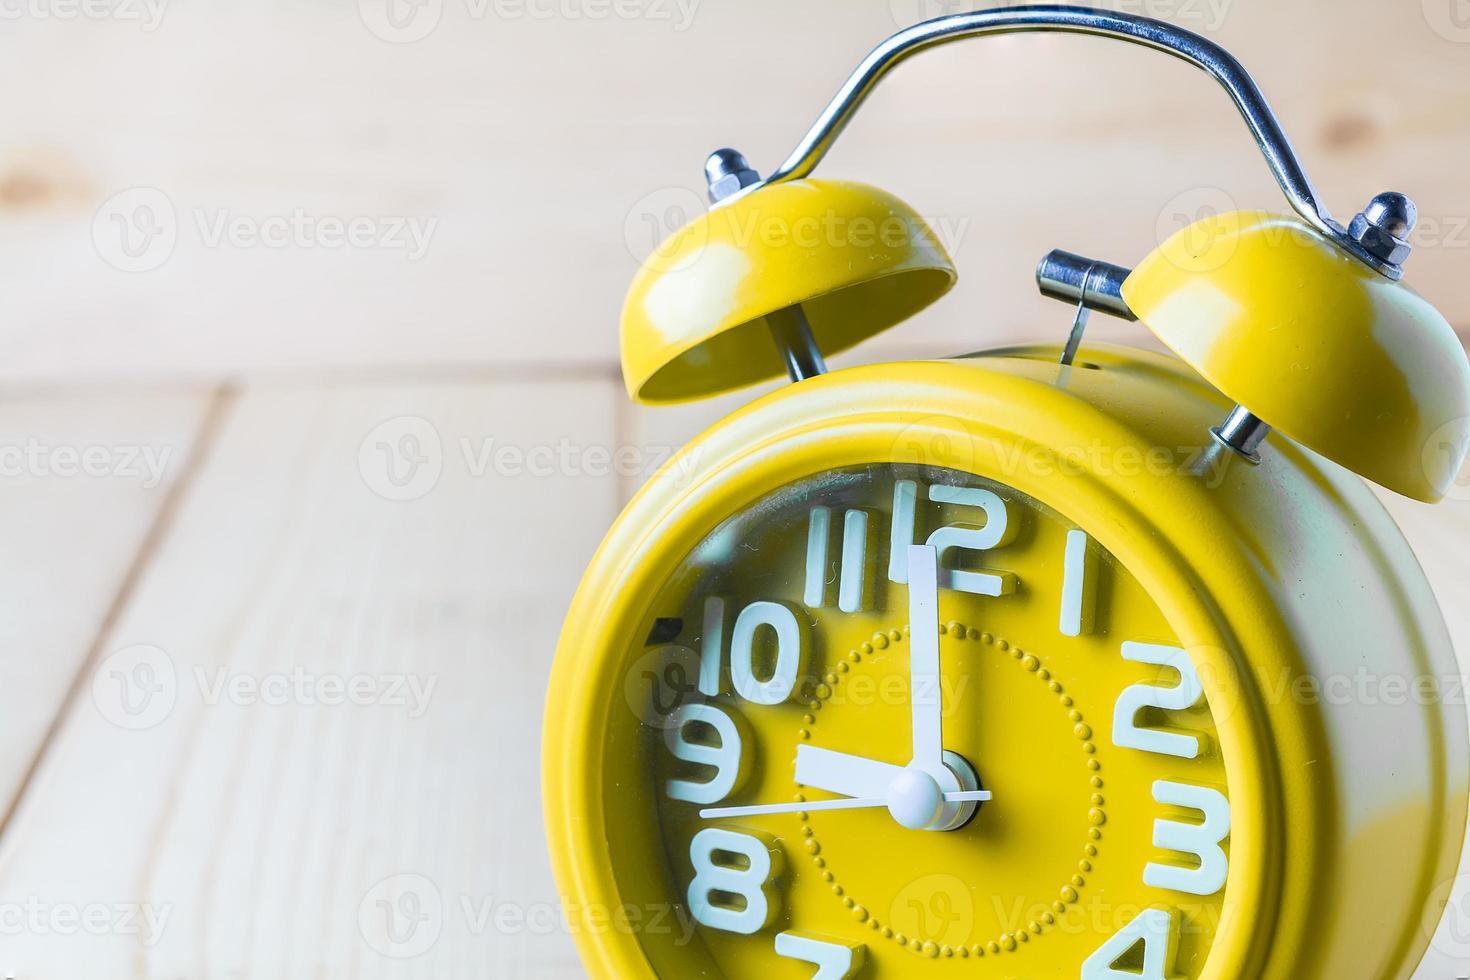 despertador amarillo sobre fondo de madera foto